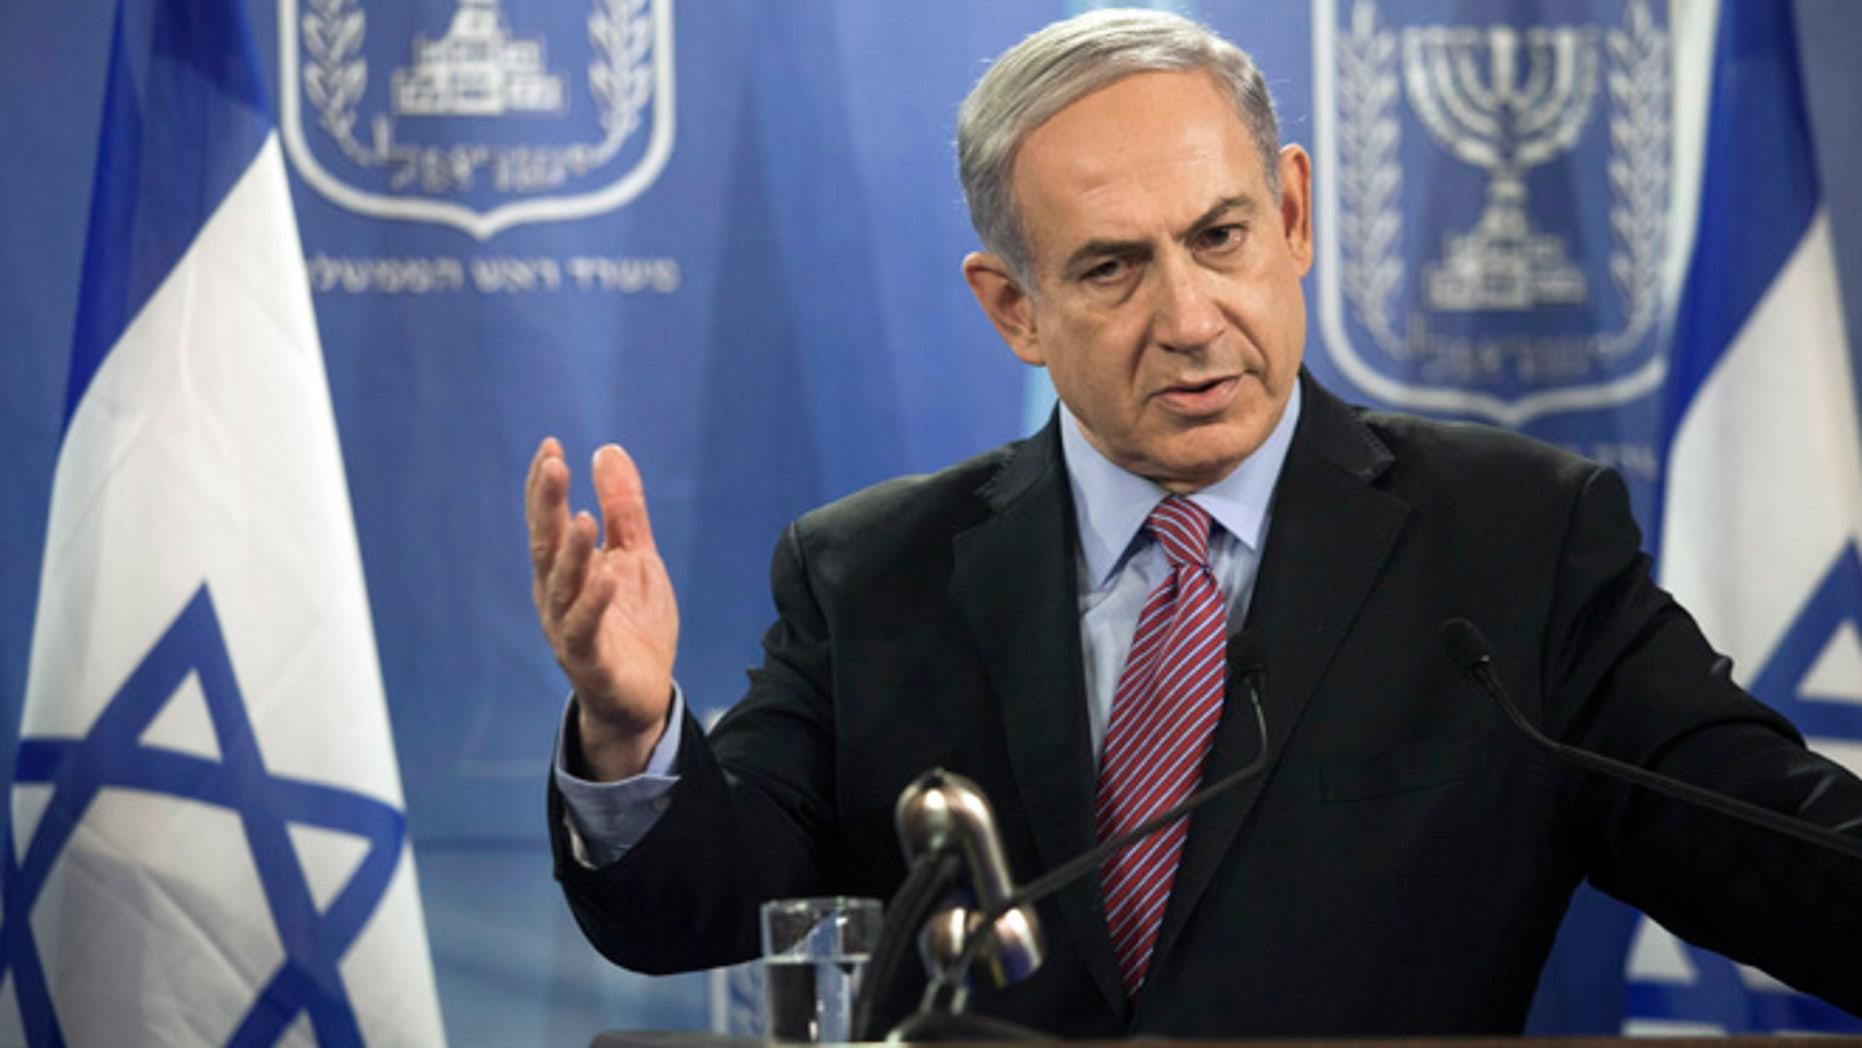 July 22, 2014: Israeli Prime Minister Benjamin Netanyahu speaks during a joint news conference with United Nations Secretary-General Ban Ki-moon, in Tel Aviv, Israel.